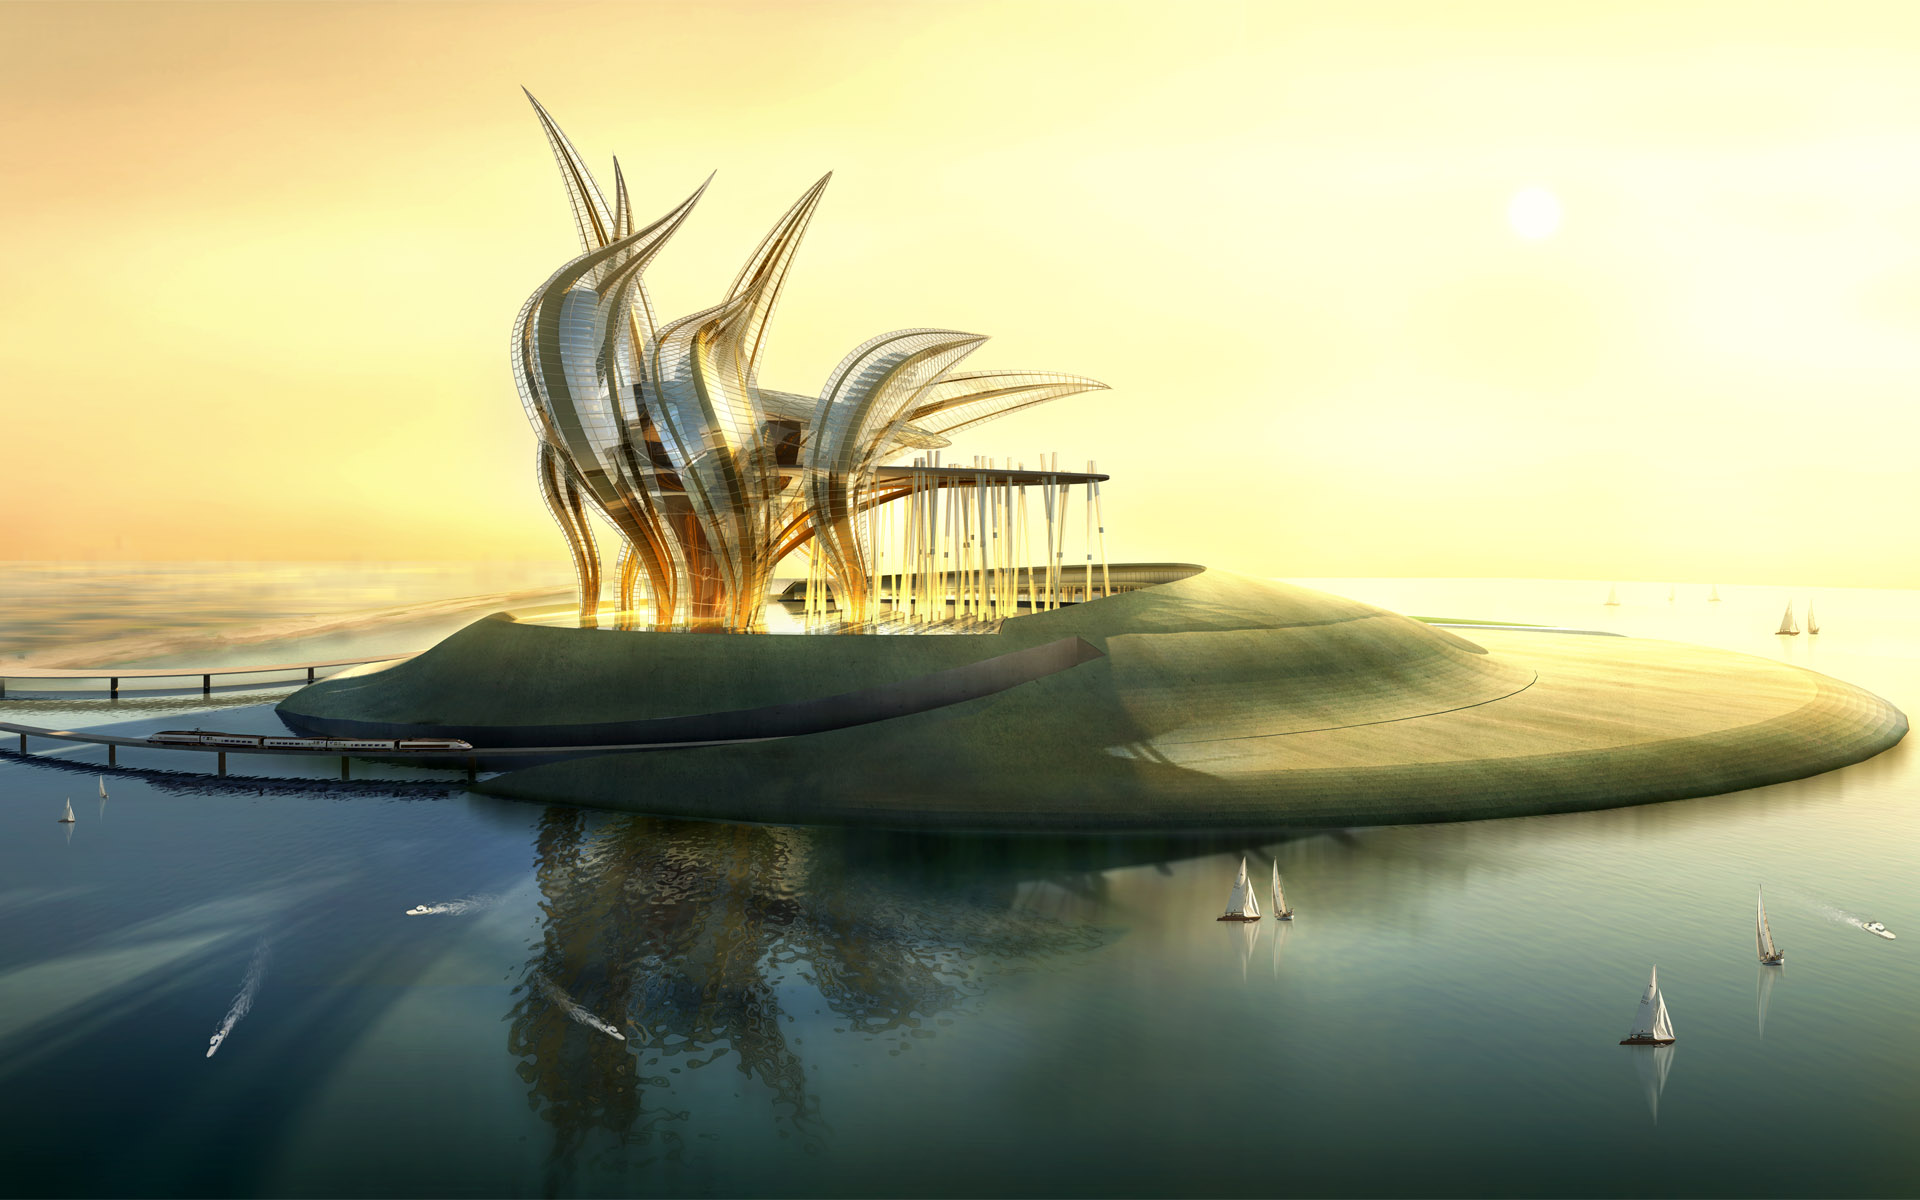 CGI - Building  Desert Island Sunset Wallpaper